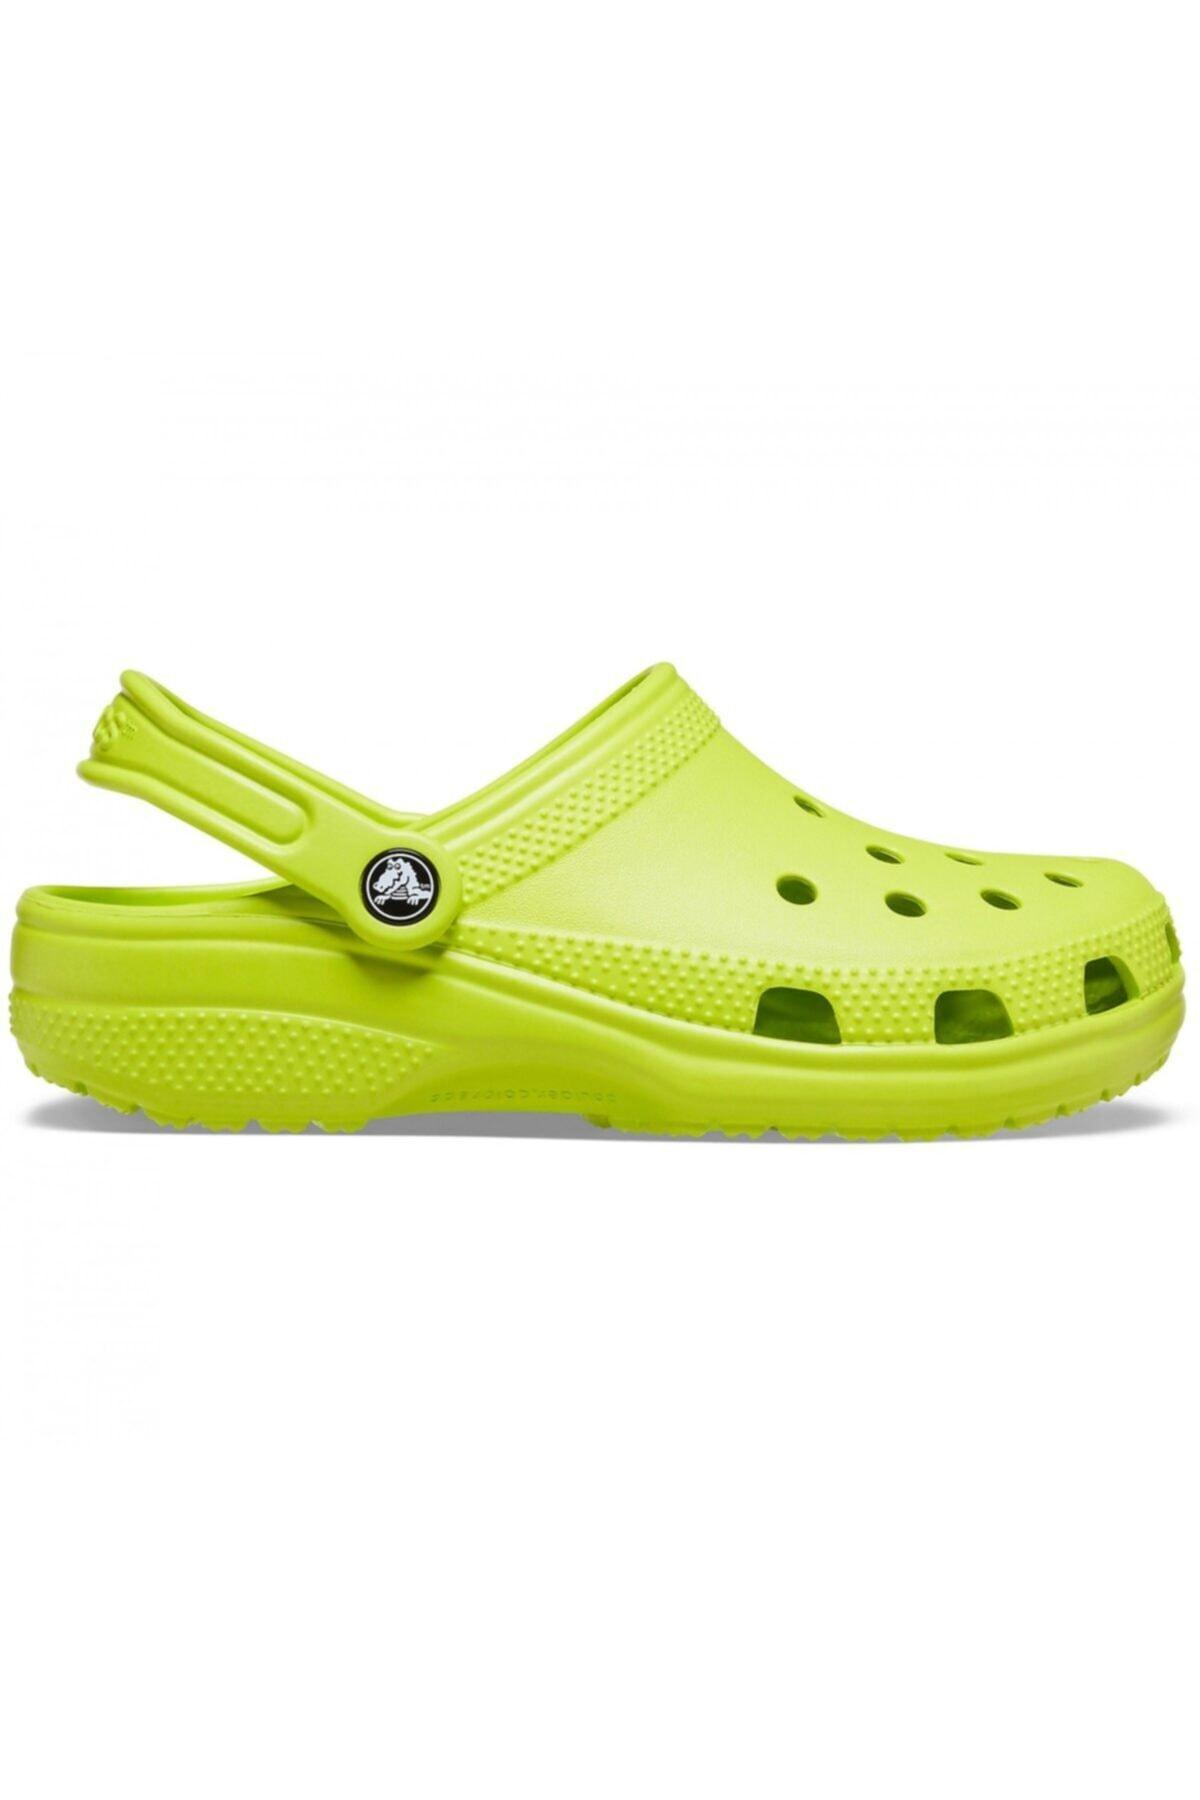 Crocs Classic Life Style Sandalet 10001-3tx 1